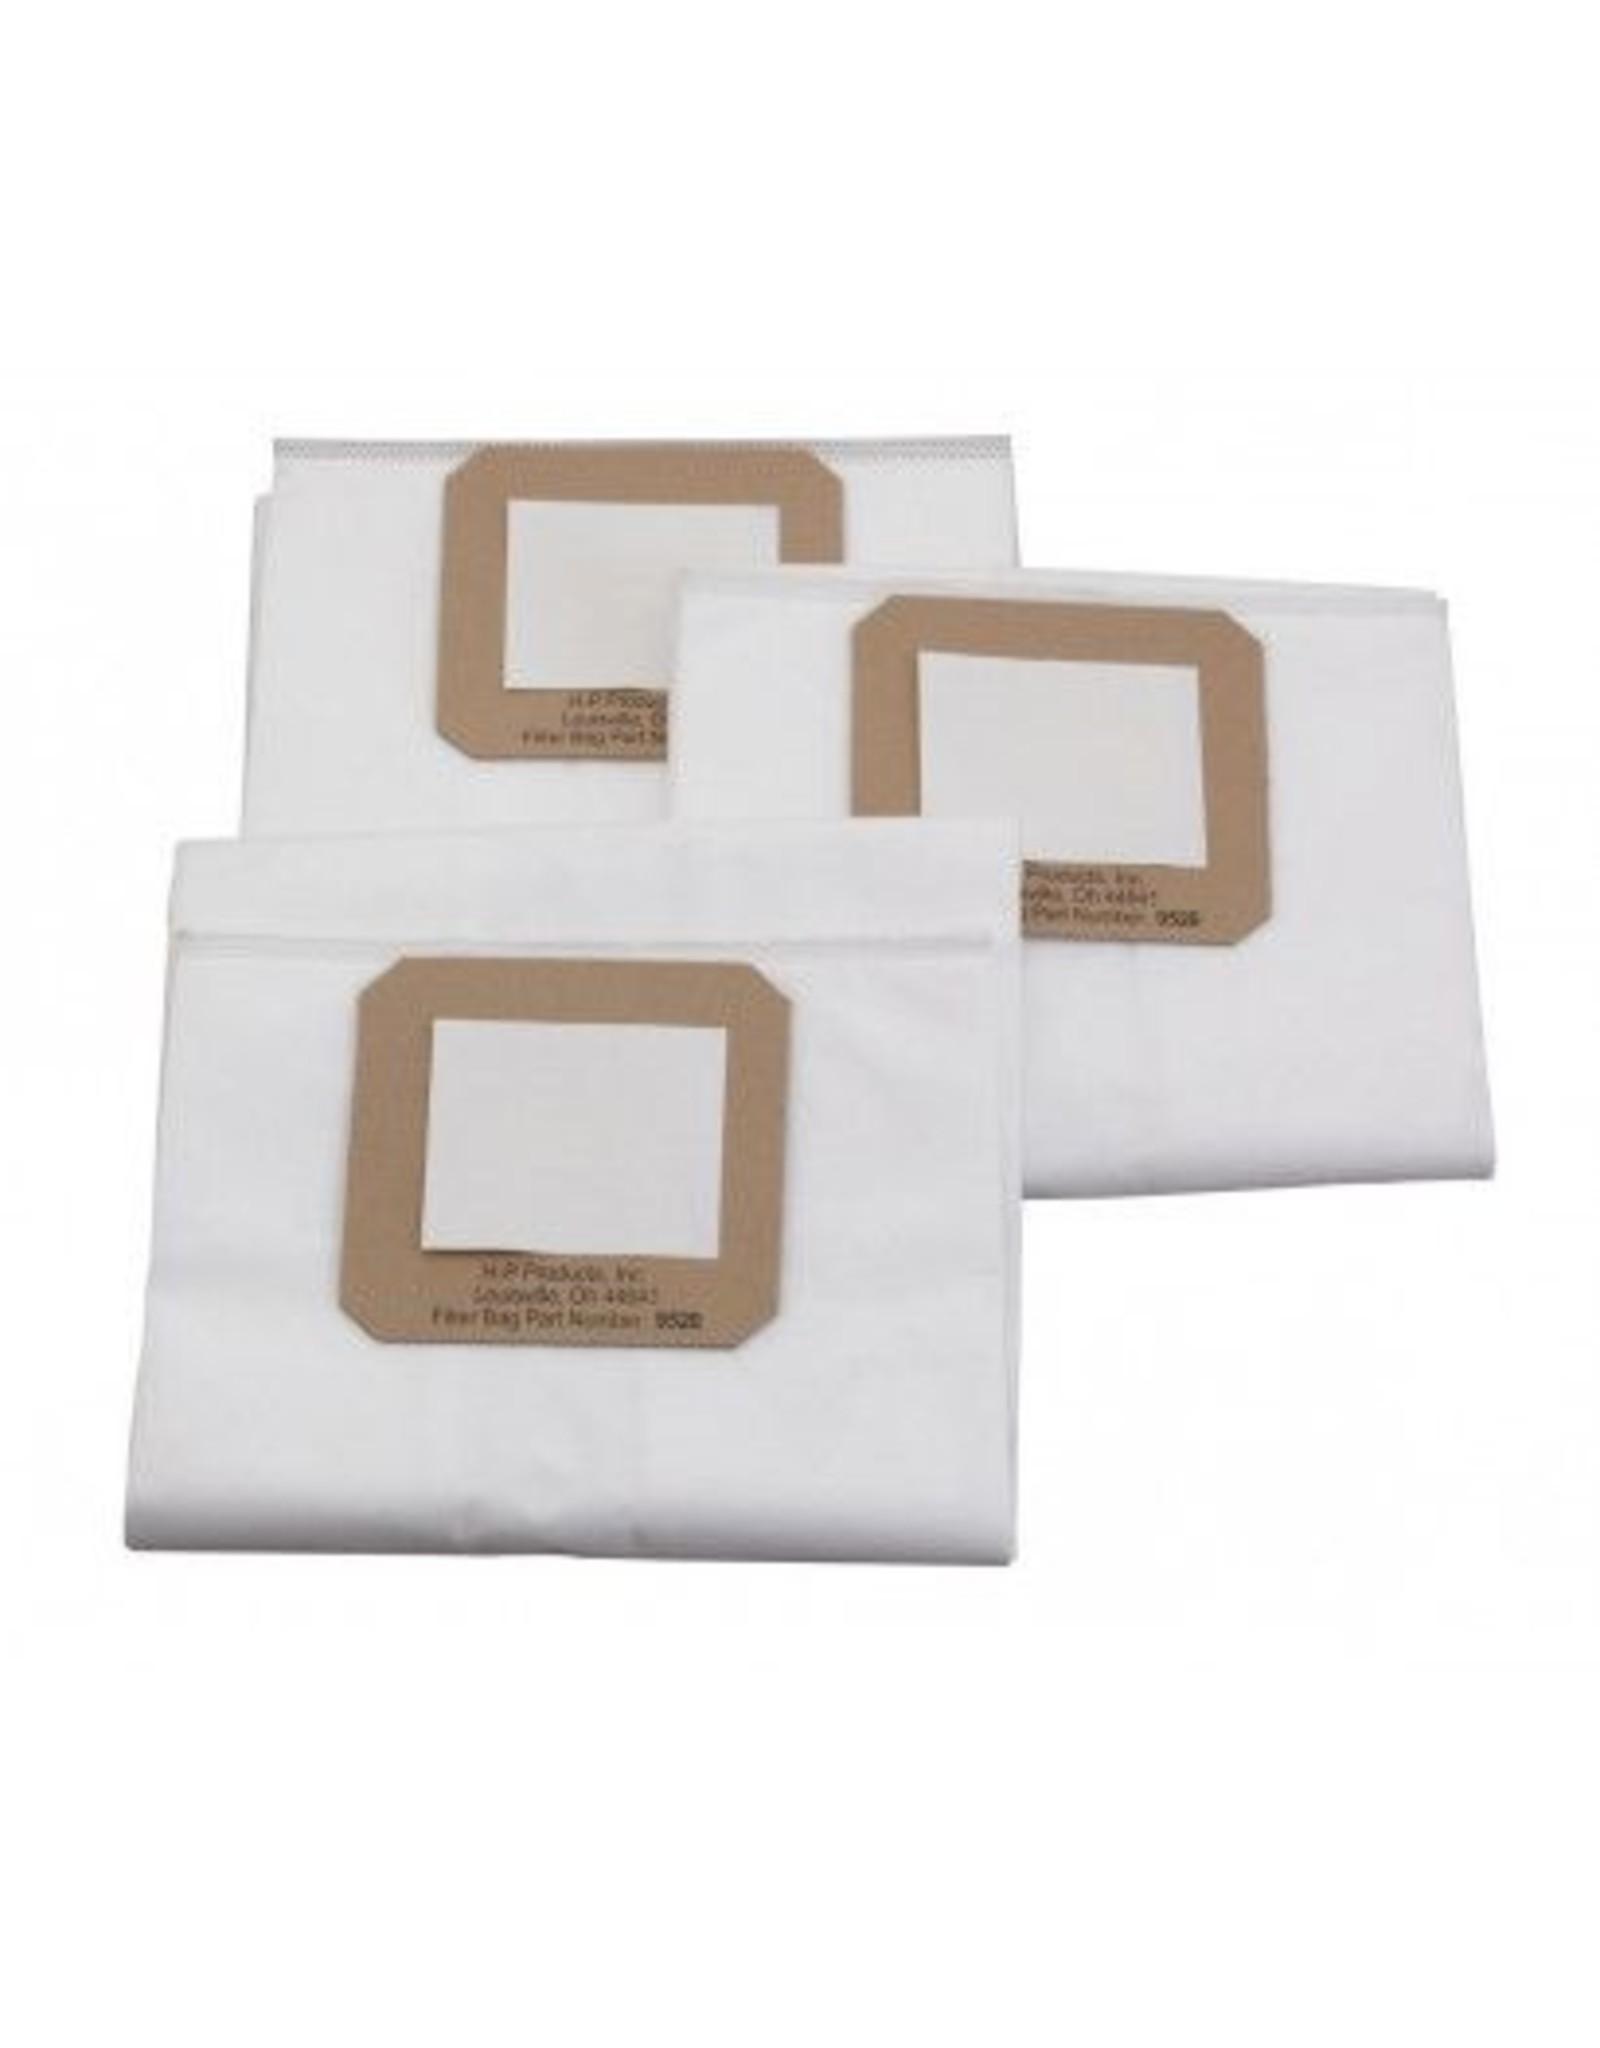 Vacuflo Vacuflo Maxum Replacement Bags (3 pack)